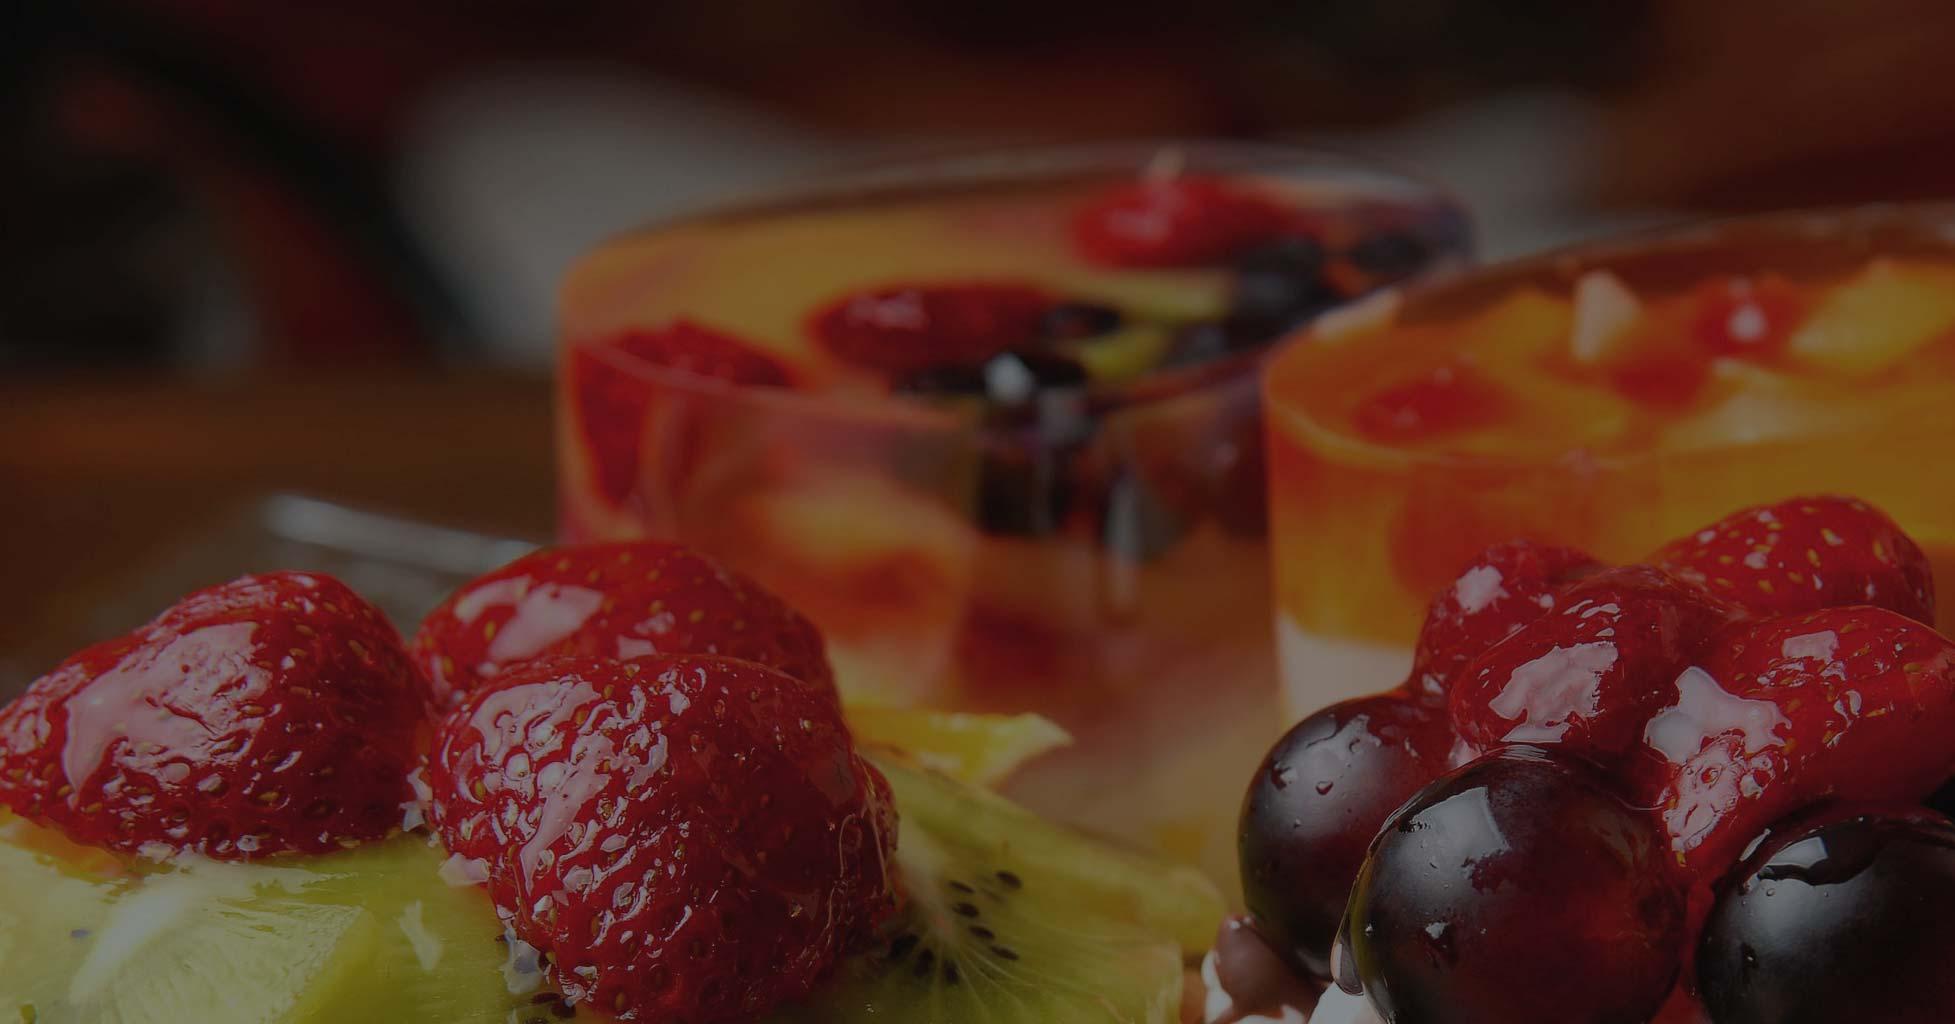 МЕНЮ —  Десерты